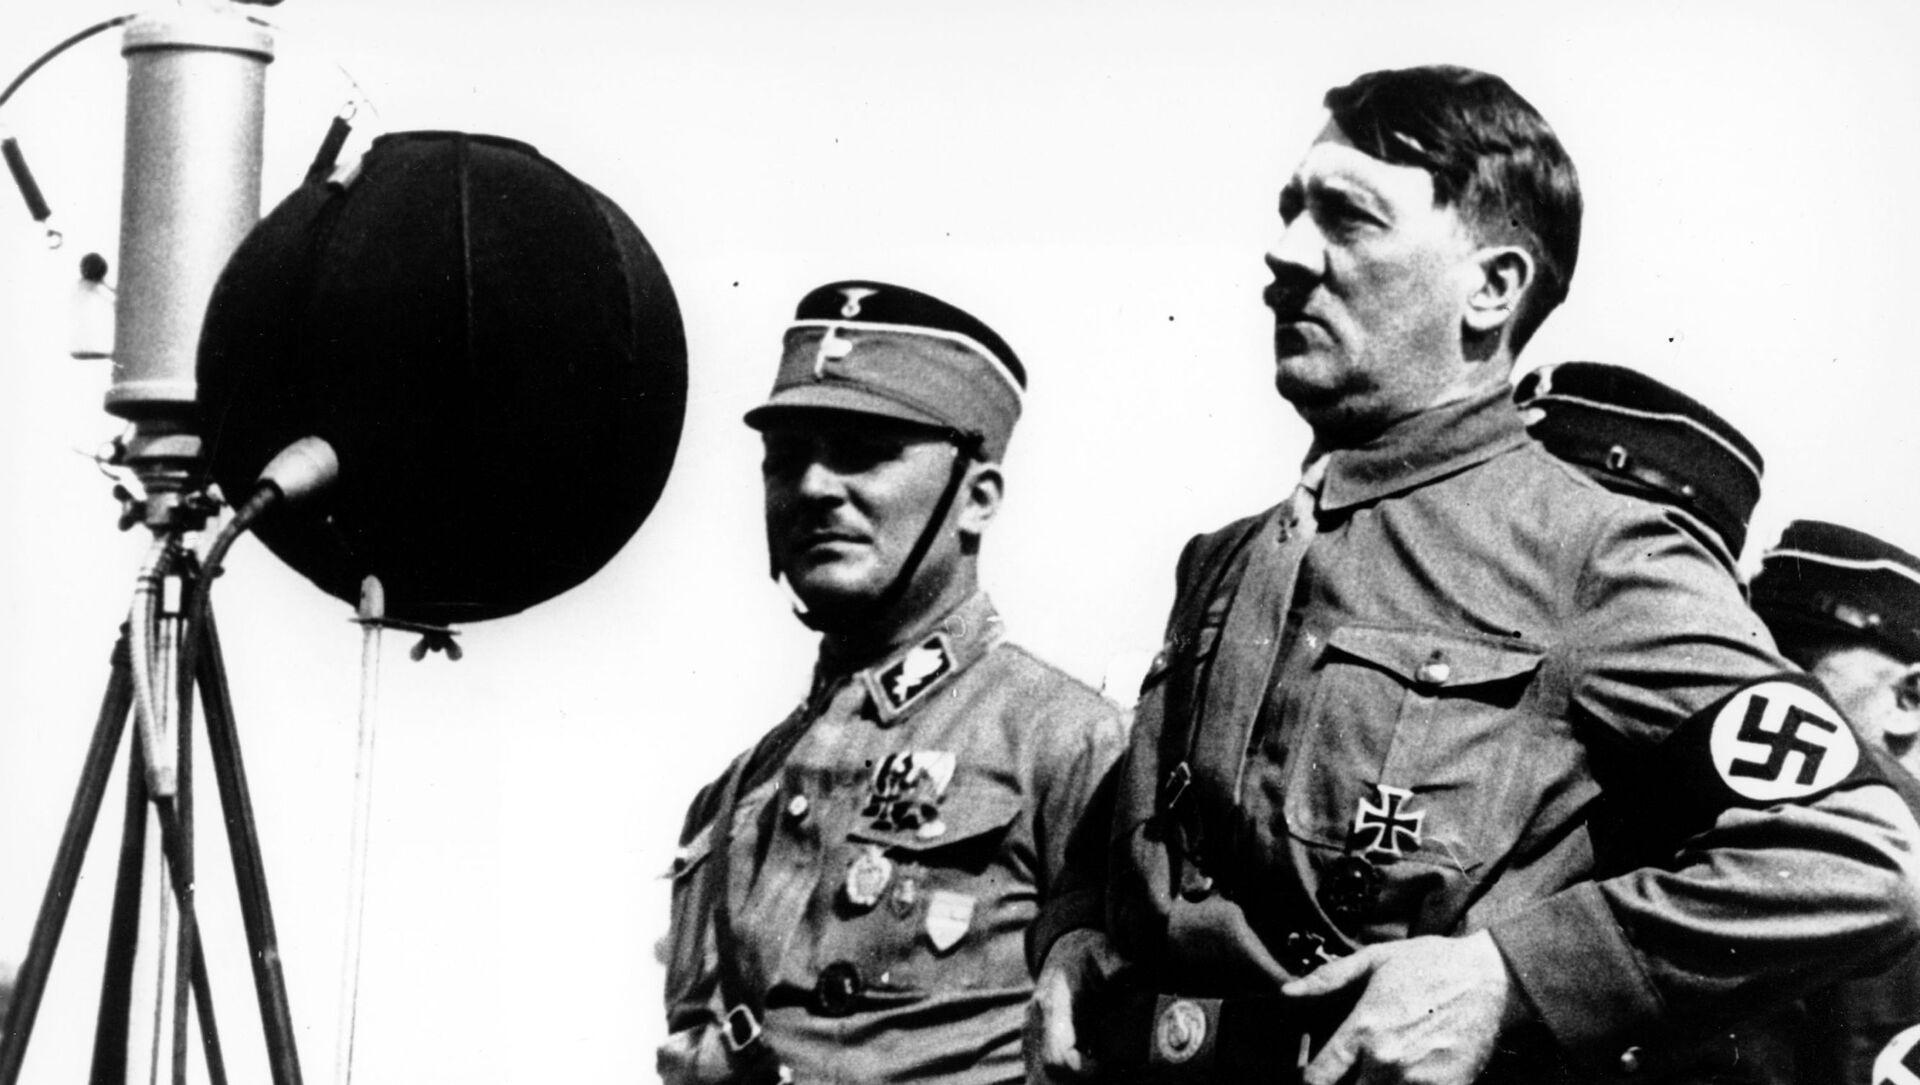 Адольф Гитлер, фото из архива - Sputnik Азербайджан, 1920, 28.04.2021